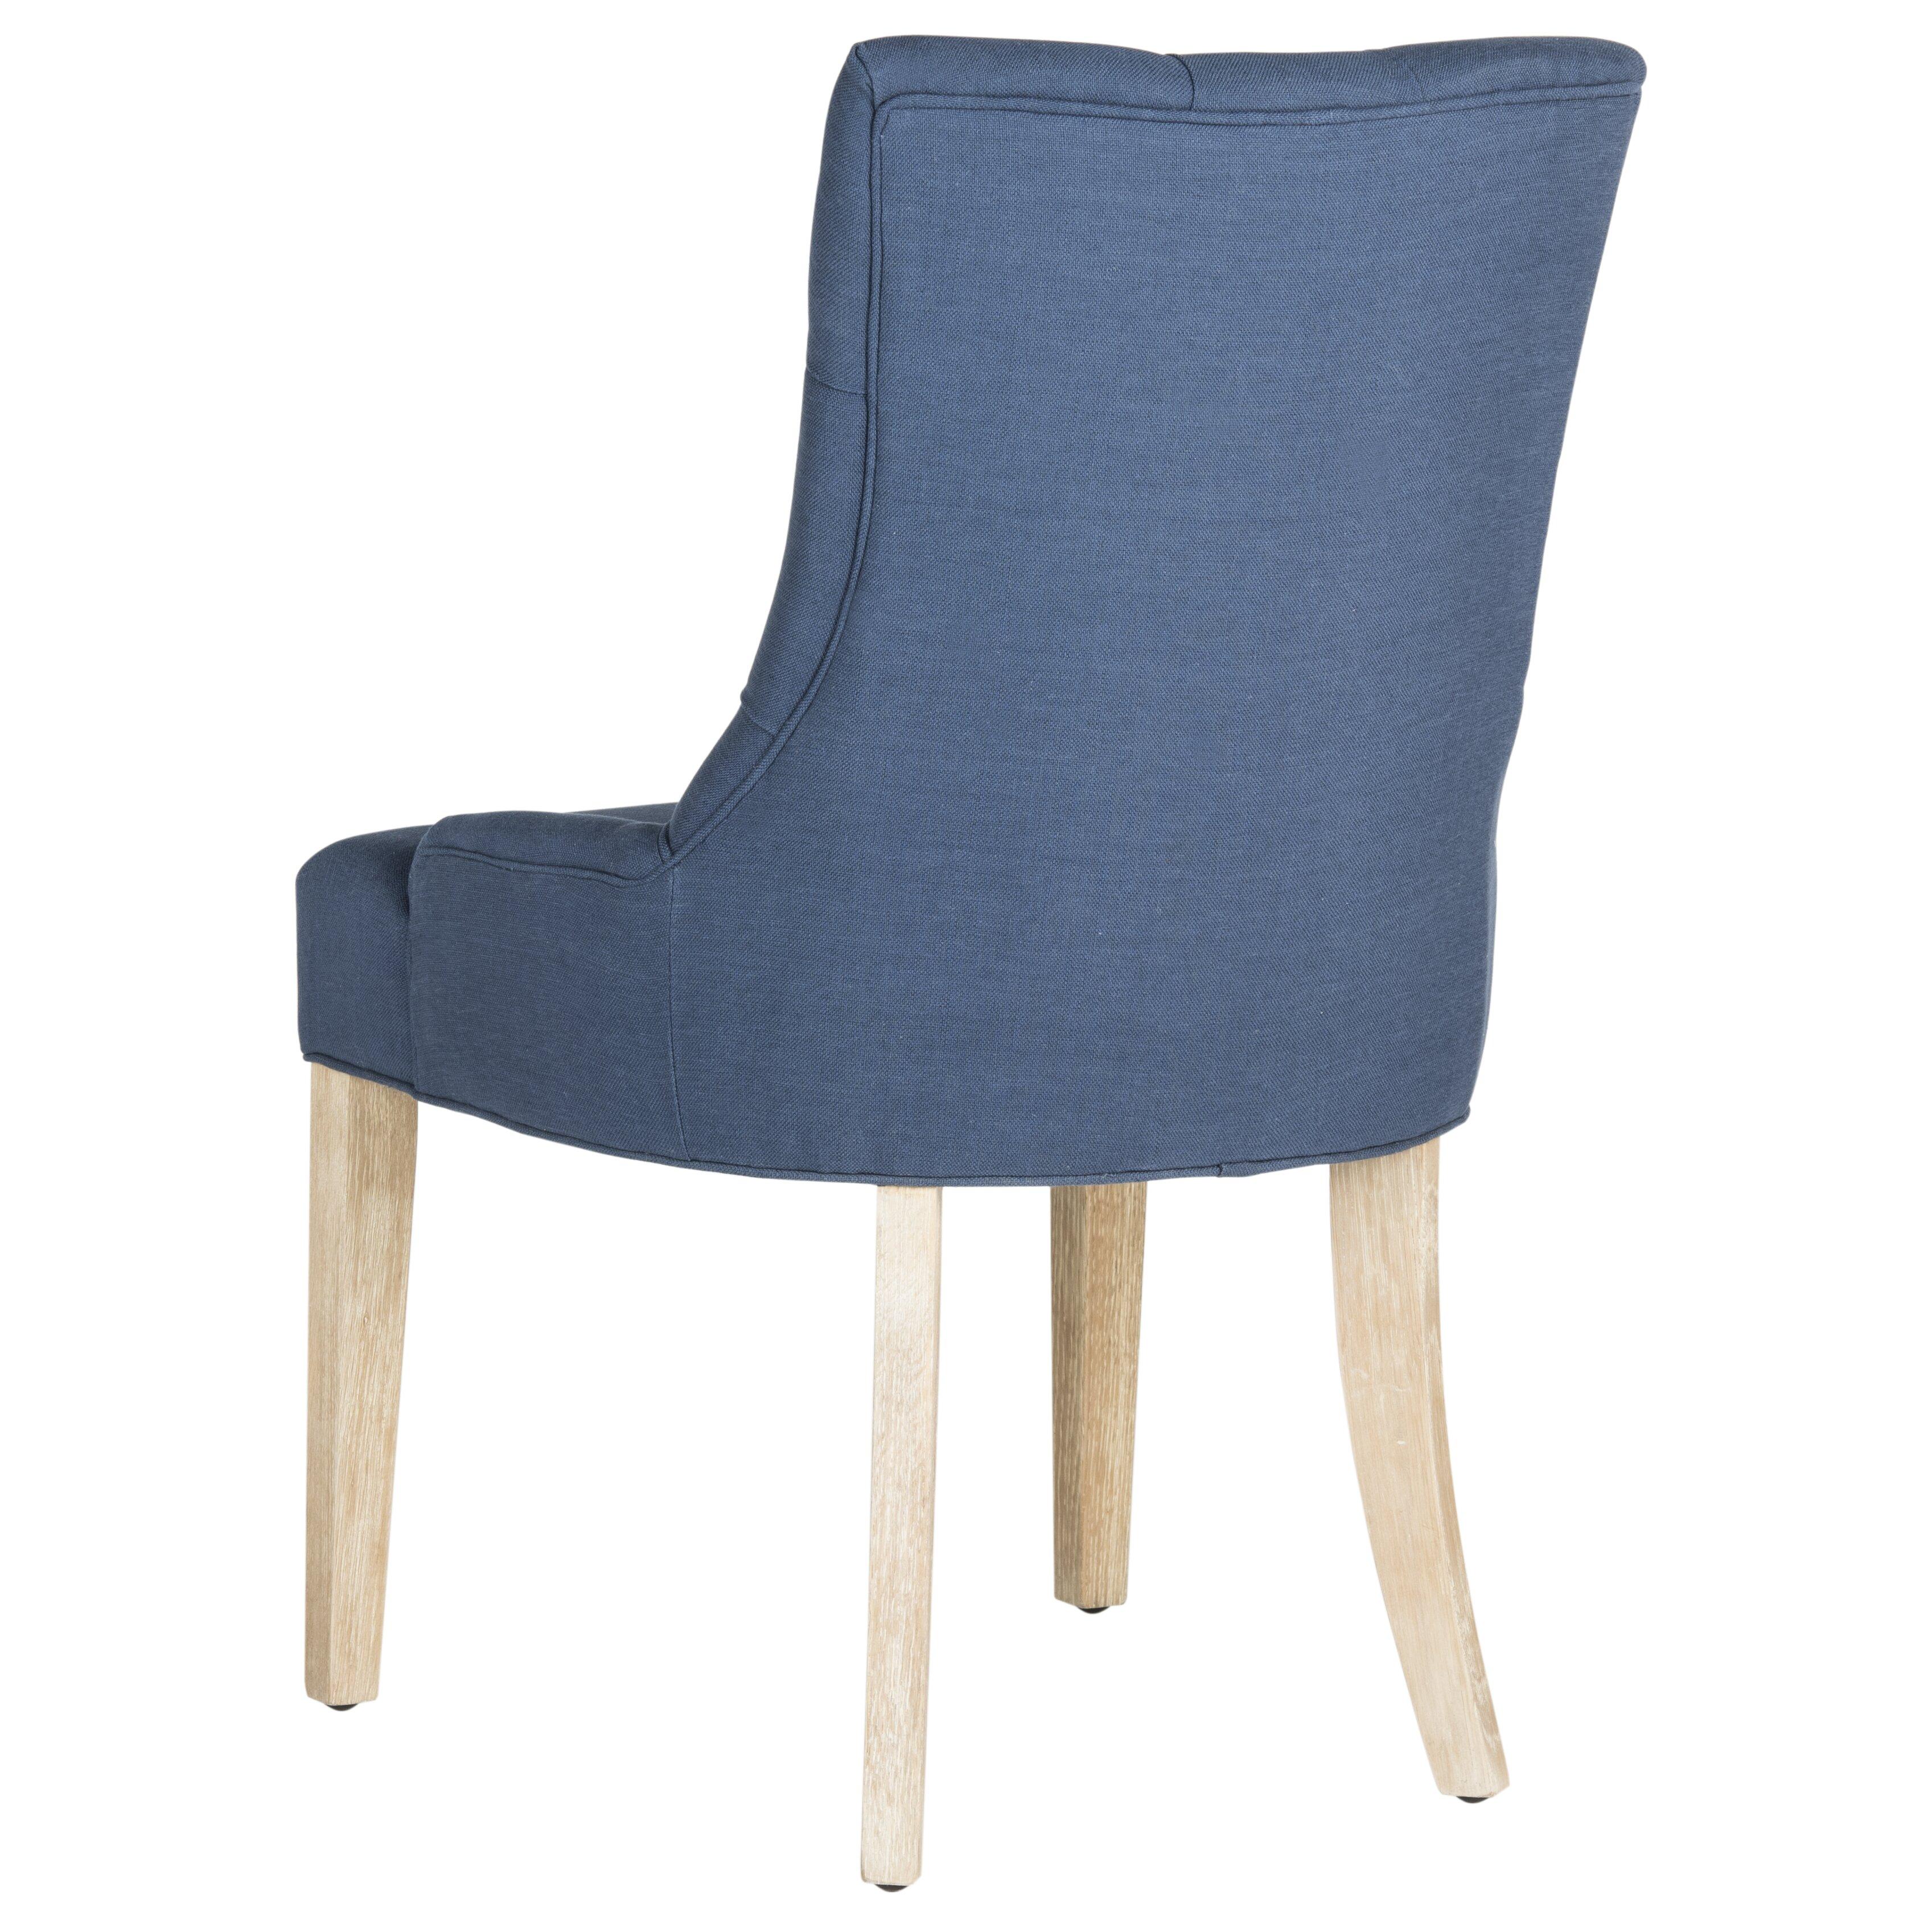 safavieh shaw upholstered dining chair reviews wayfair uk